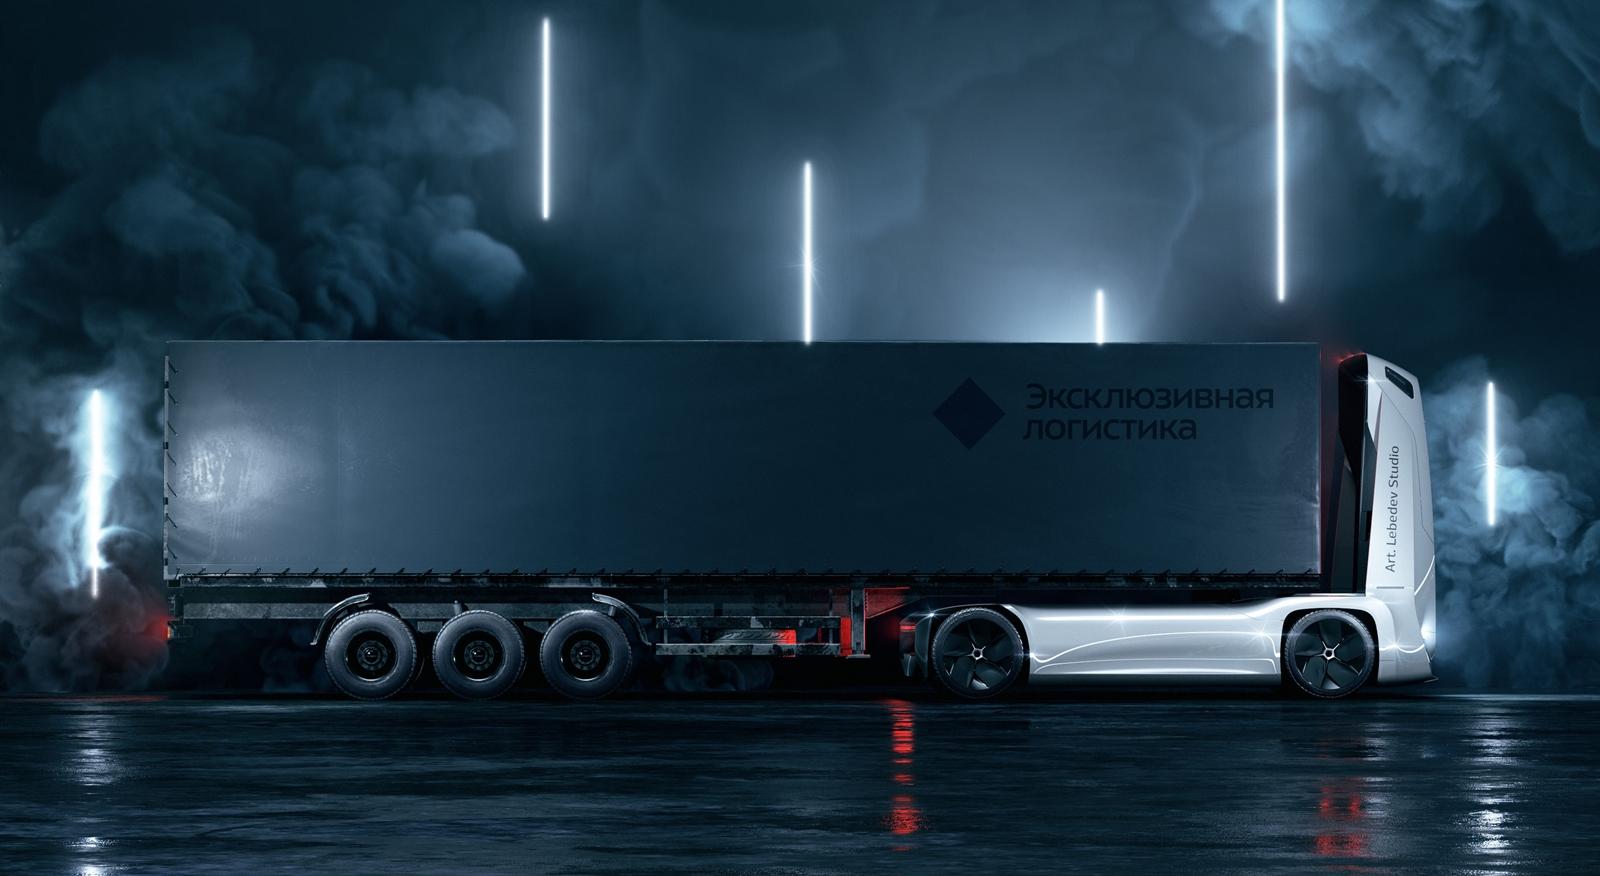 Gruzovikus Camion Autonomo (1)